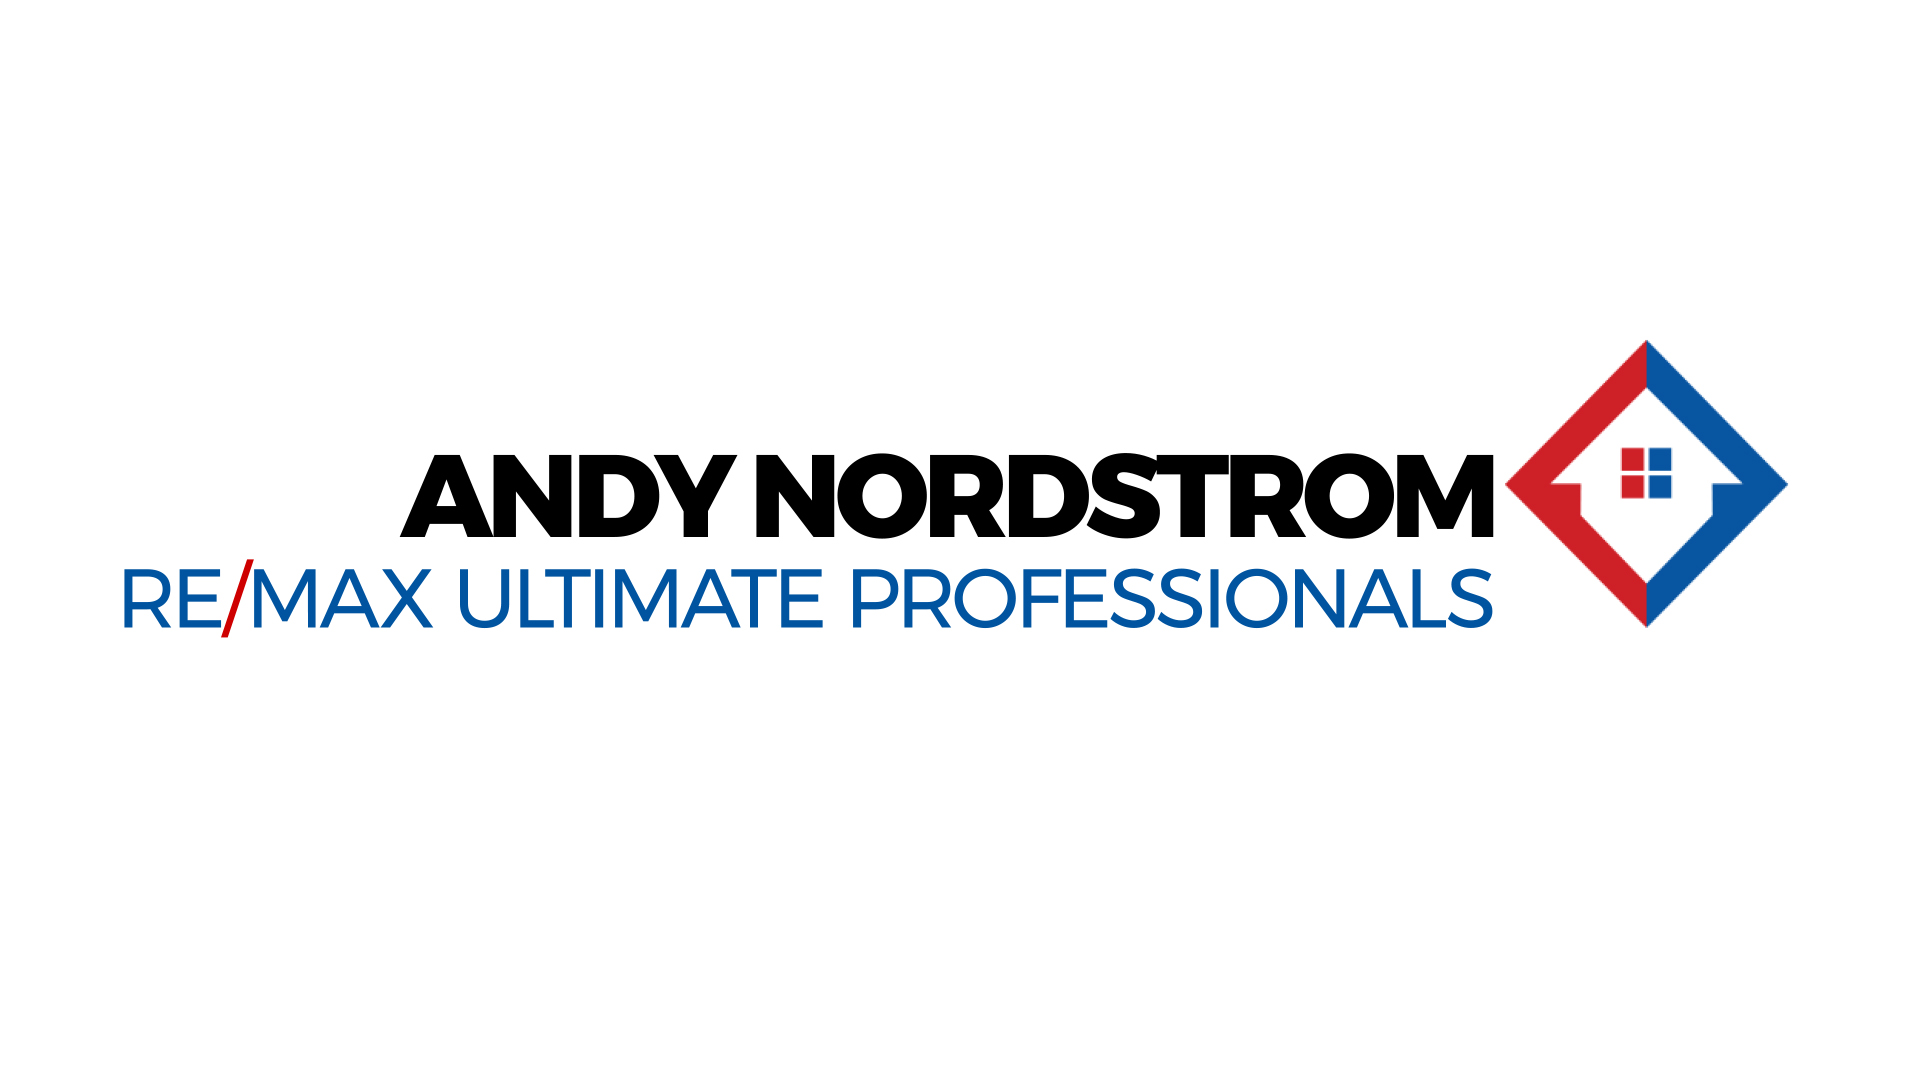 Andrew Nordstrom